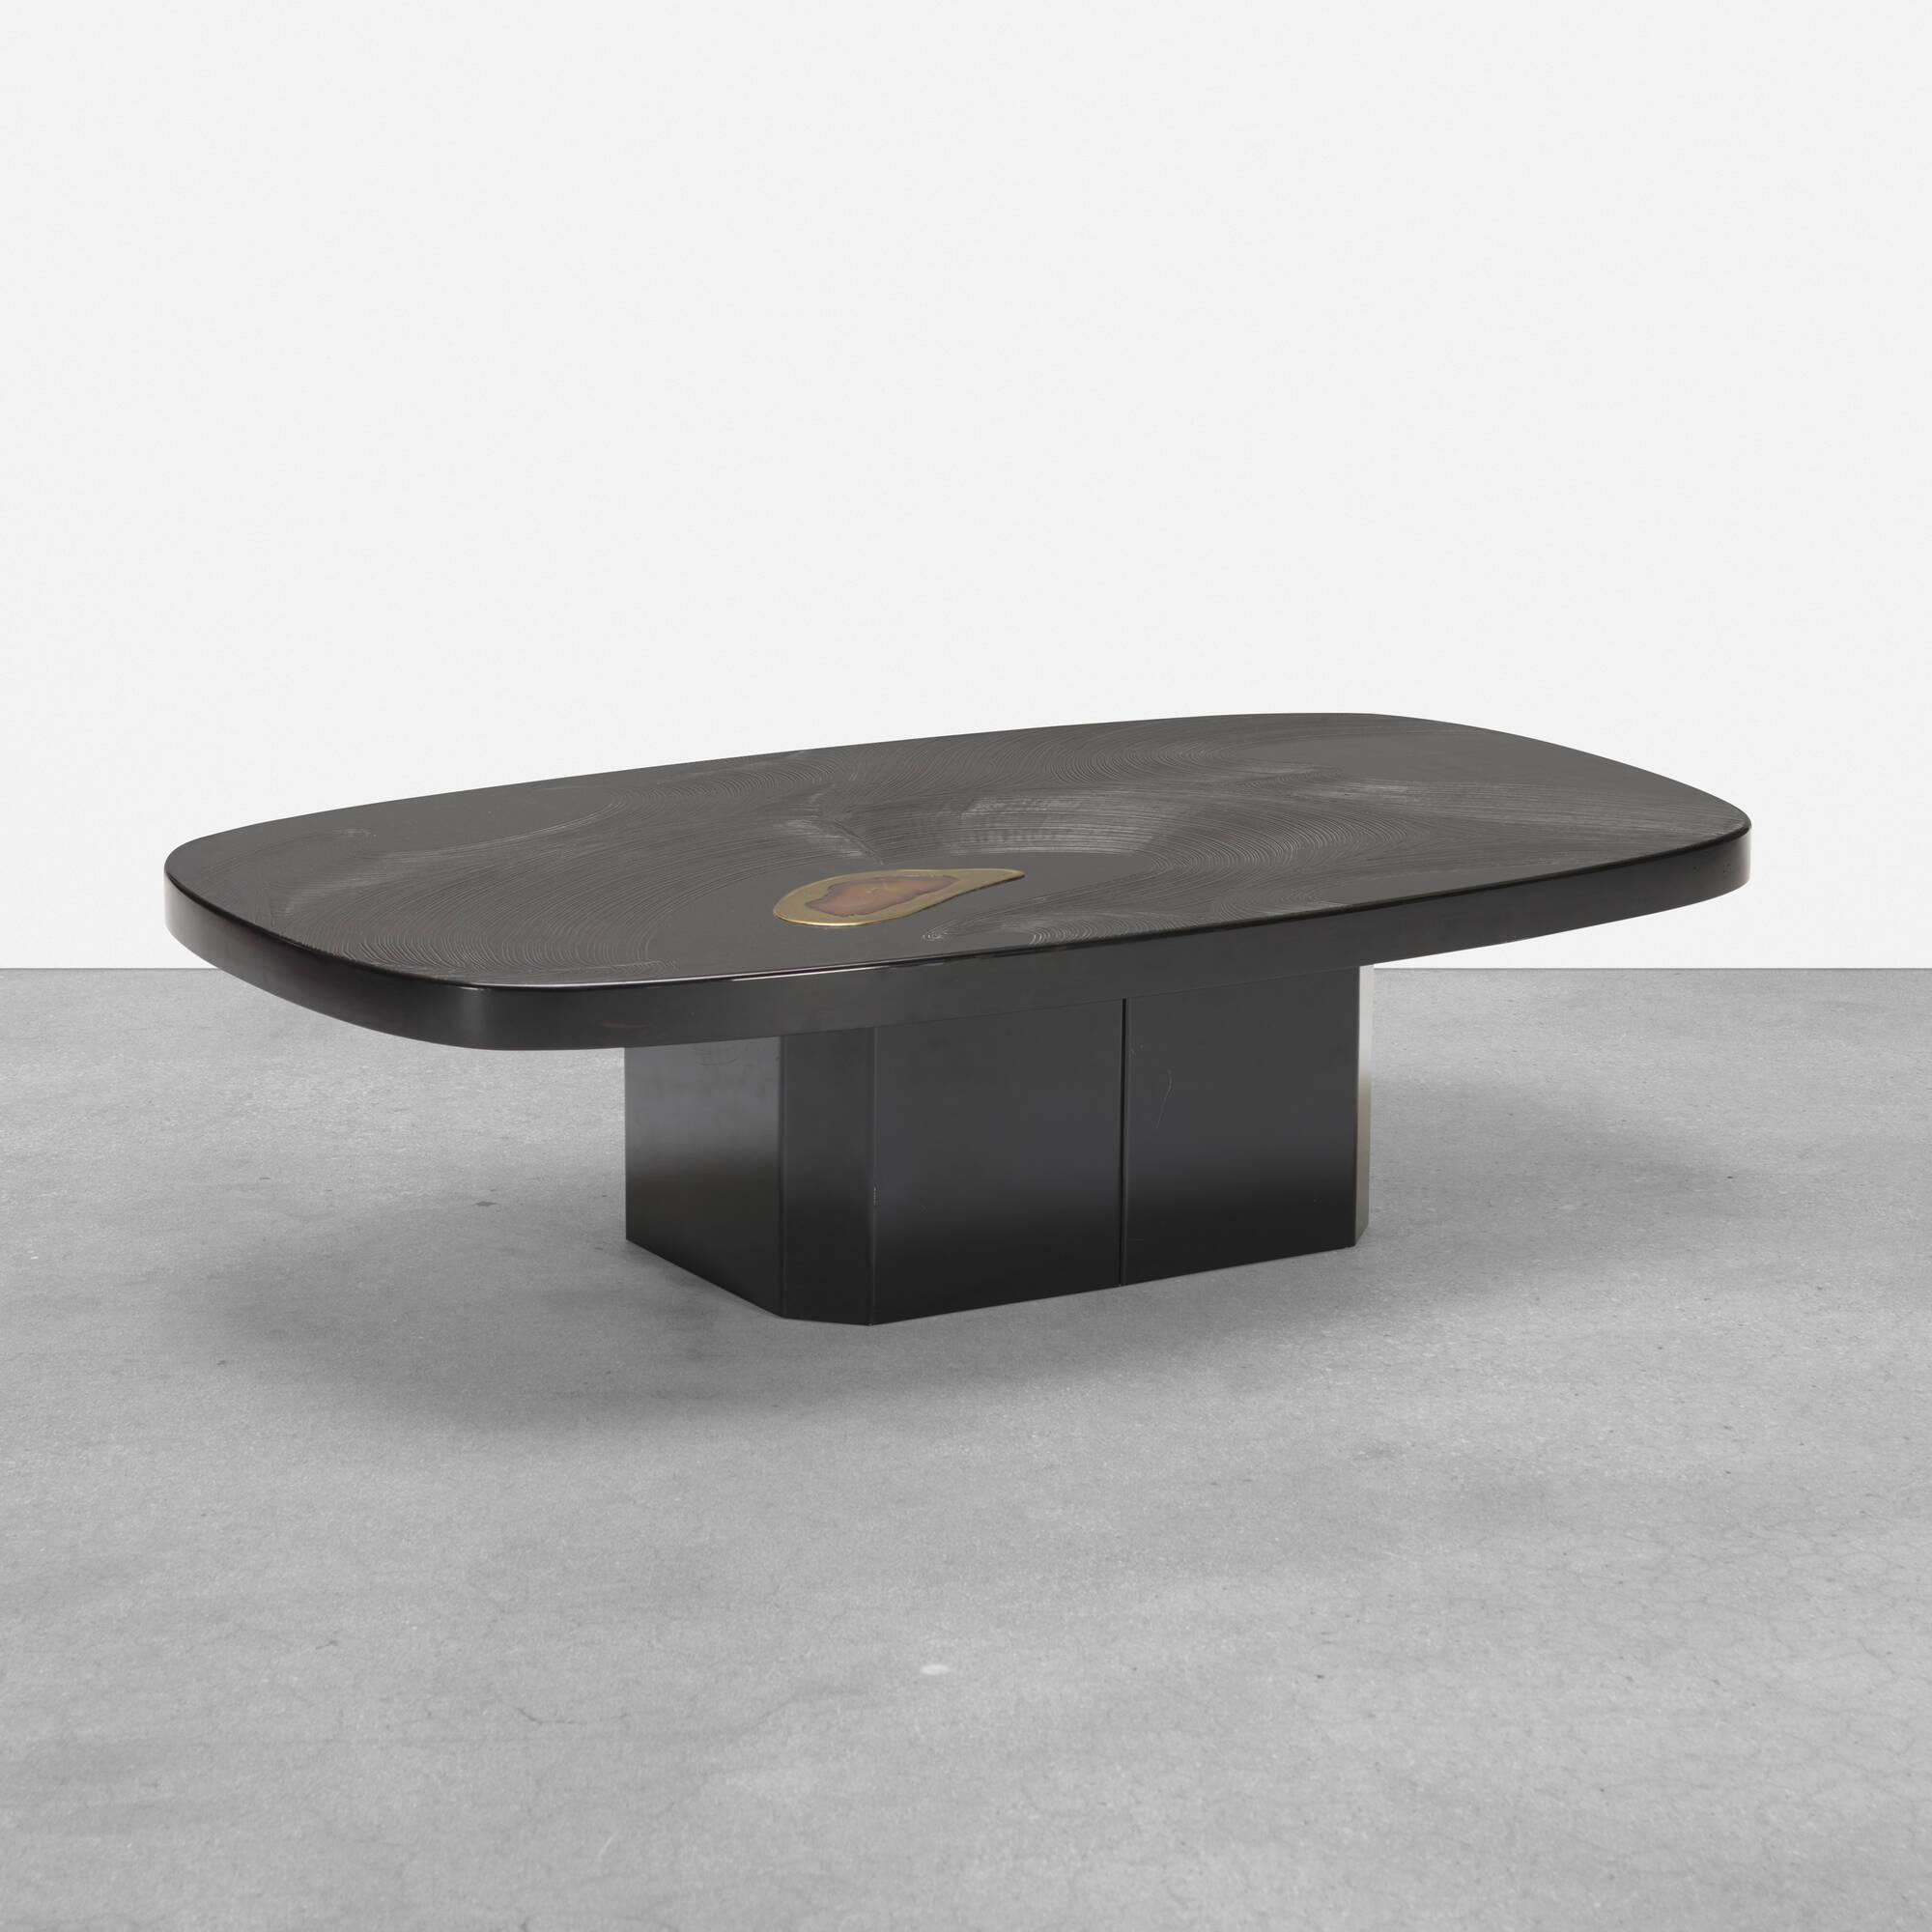 295: Jean Claude Dresse / coffee table (1 of 3)